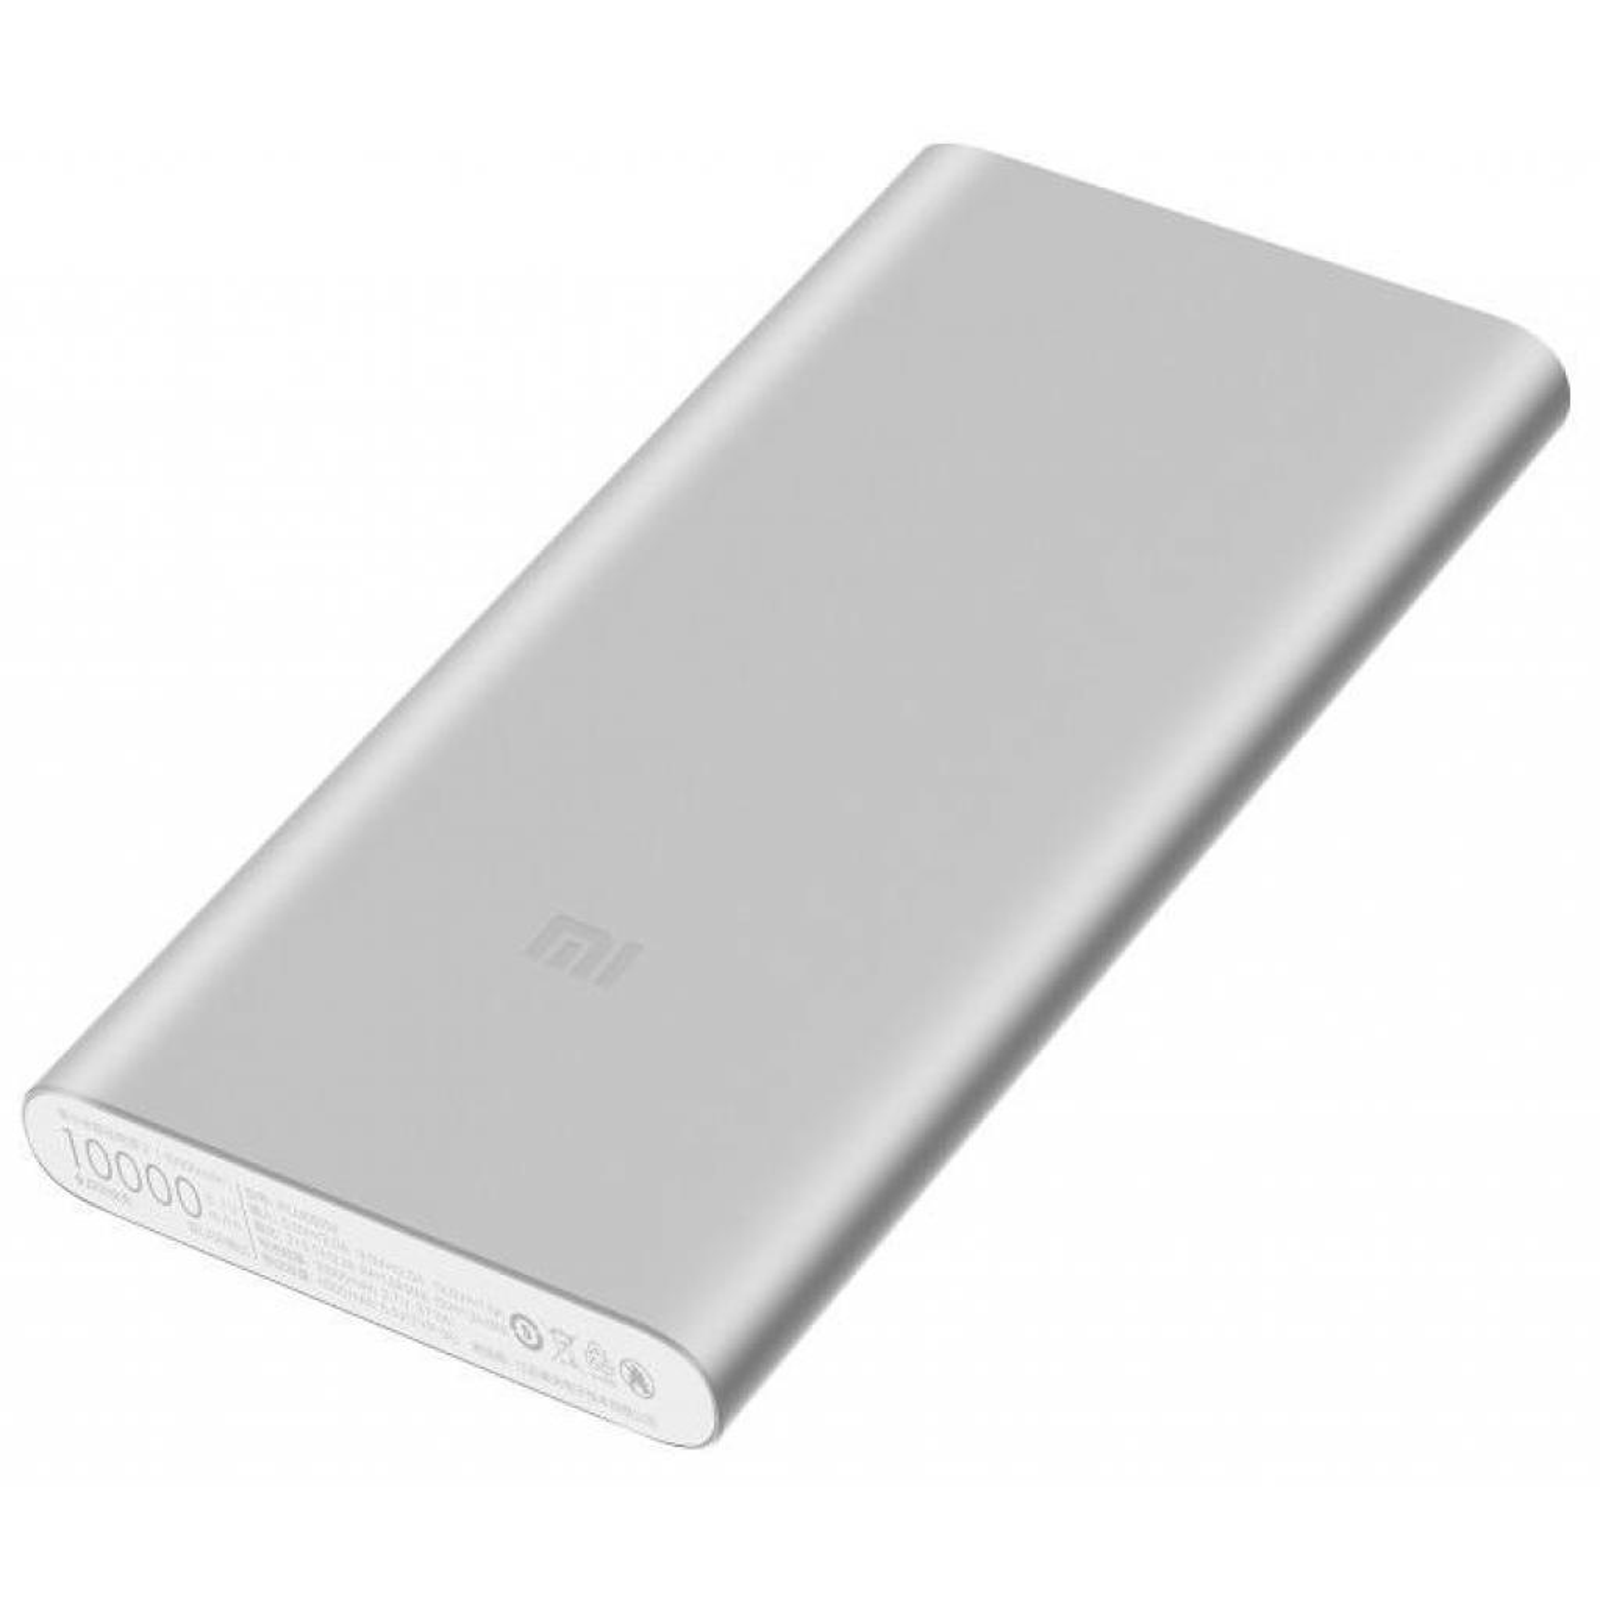 Батарея универсальная Xiaomi Mi Power Bank 2S 10000 mAh QC2.0(2.4A,2USB) (PLM09ZM) Silver (VXN4231GL / VXN4228CN) изображение 2